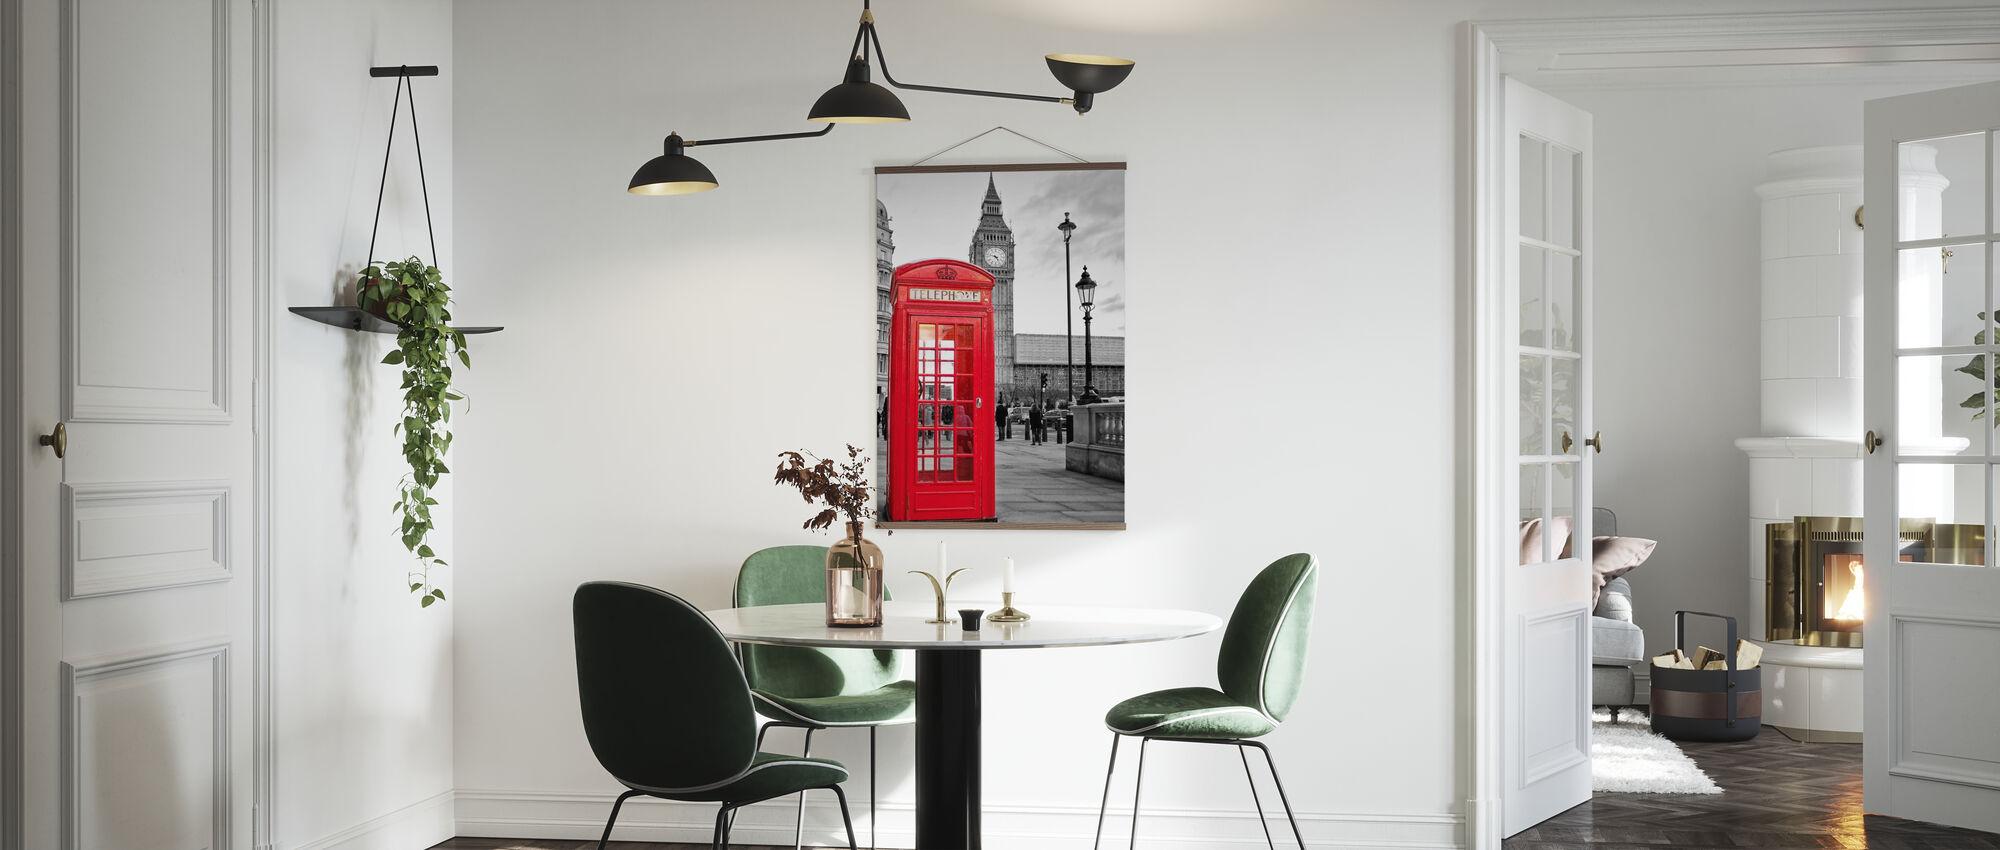 London Telephone - Poster - Kitchen